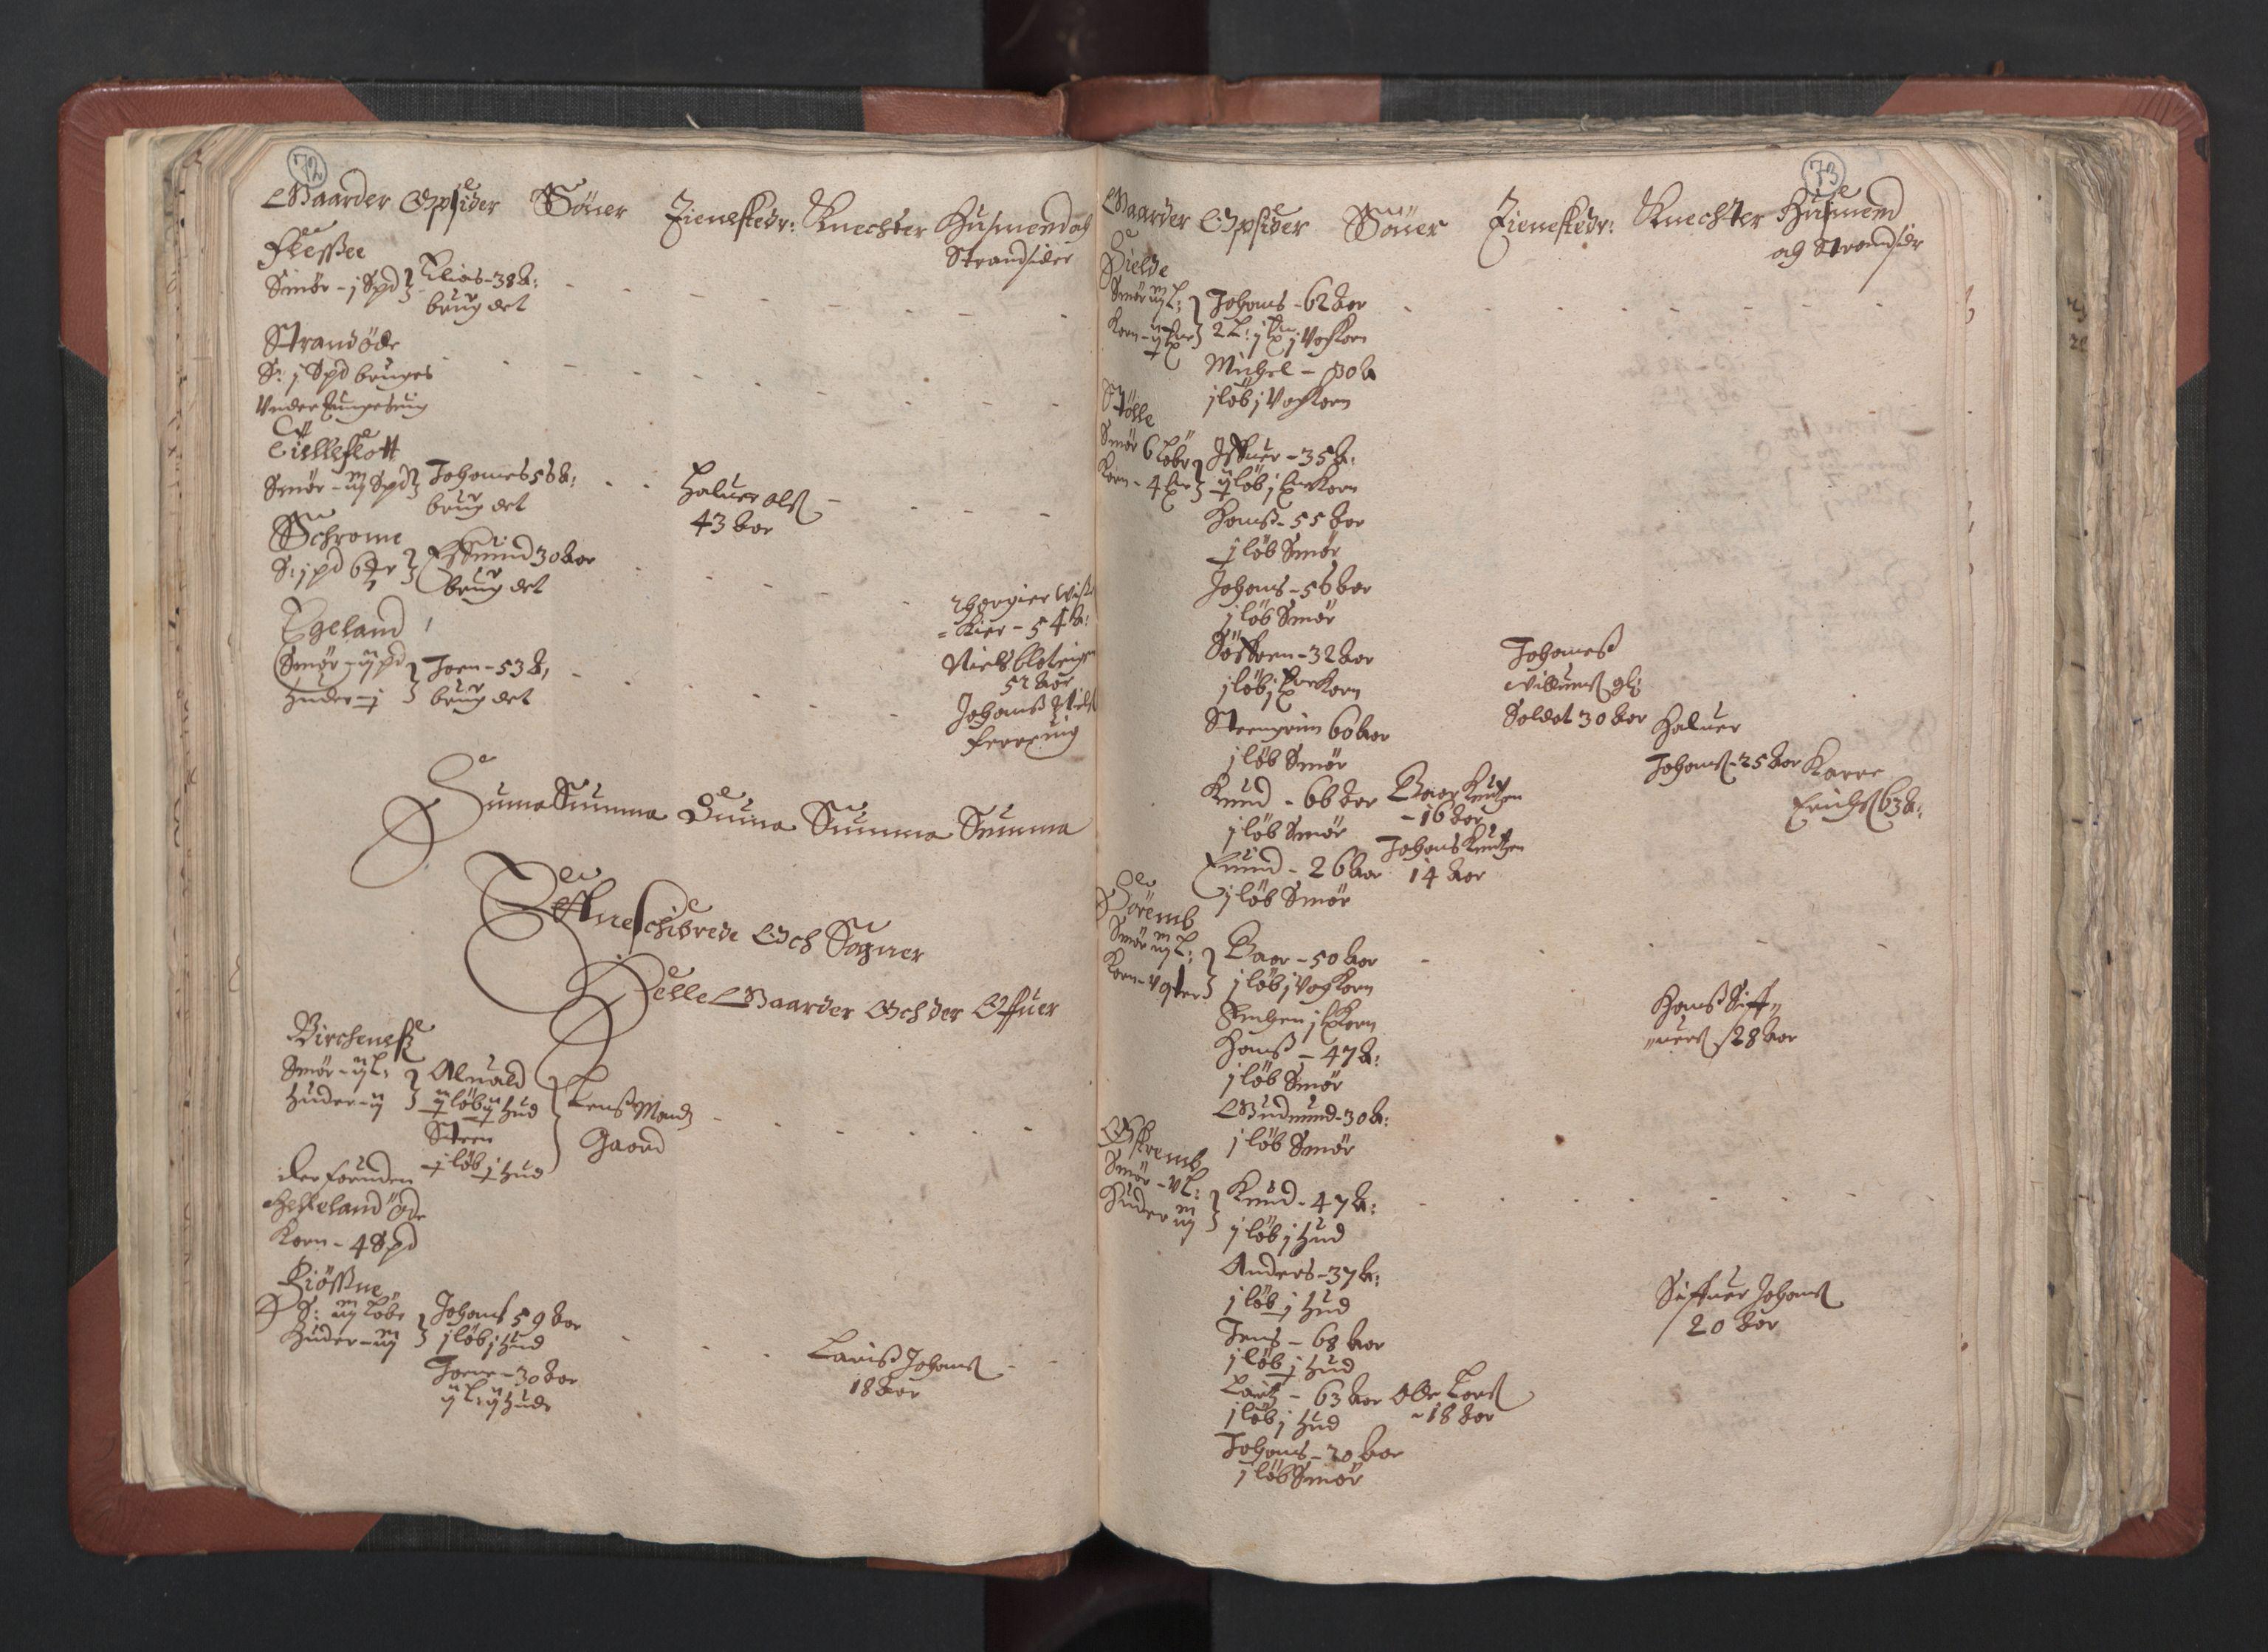 RA, Fogdenes og sorenskrivernes manntall 1664-1666, nr. 13: Nordhordland fogderi og Sunnhordland fogderi, 1665, s. 72-73